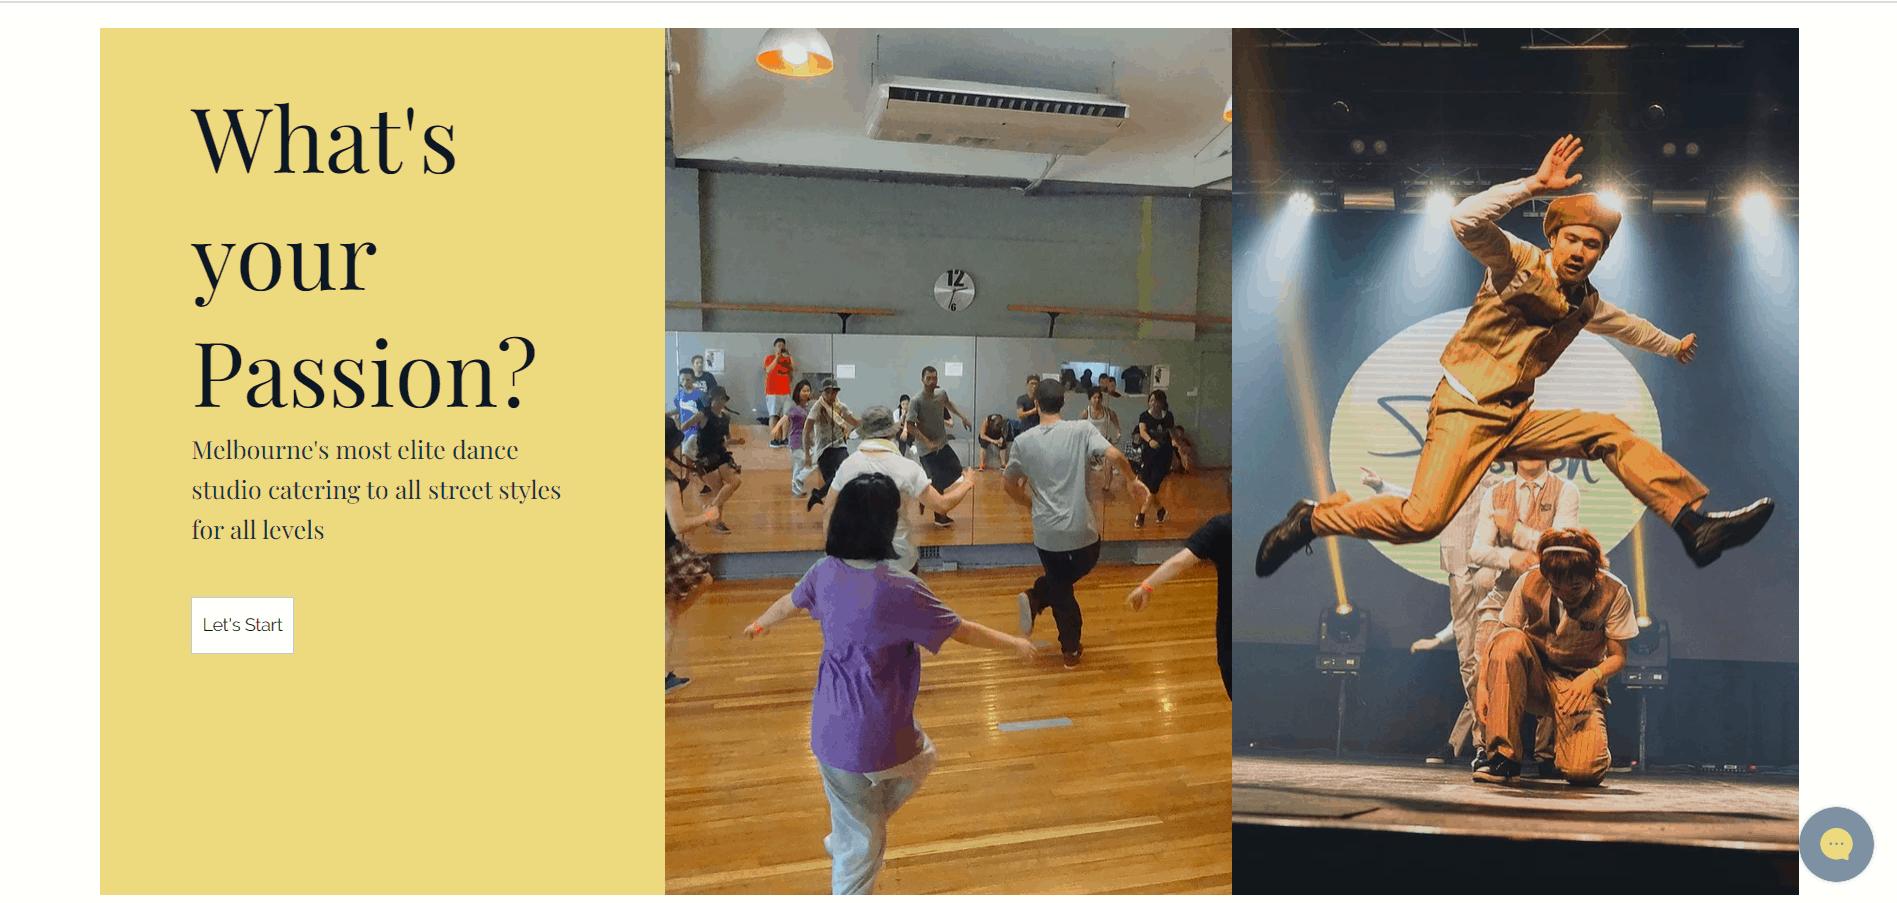 Passion Dance Studio